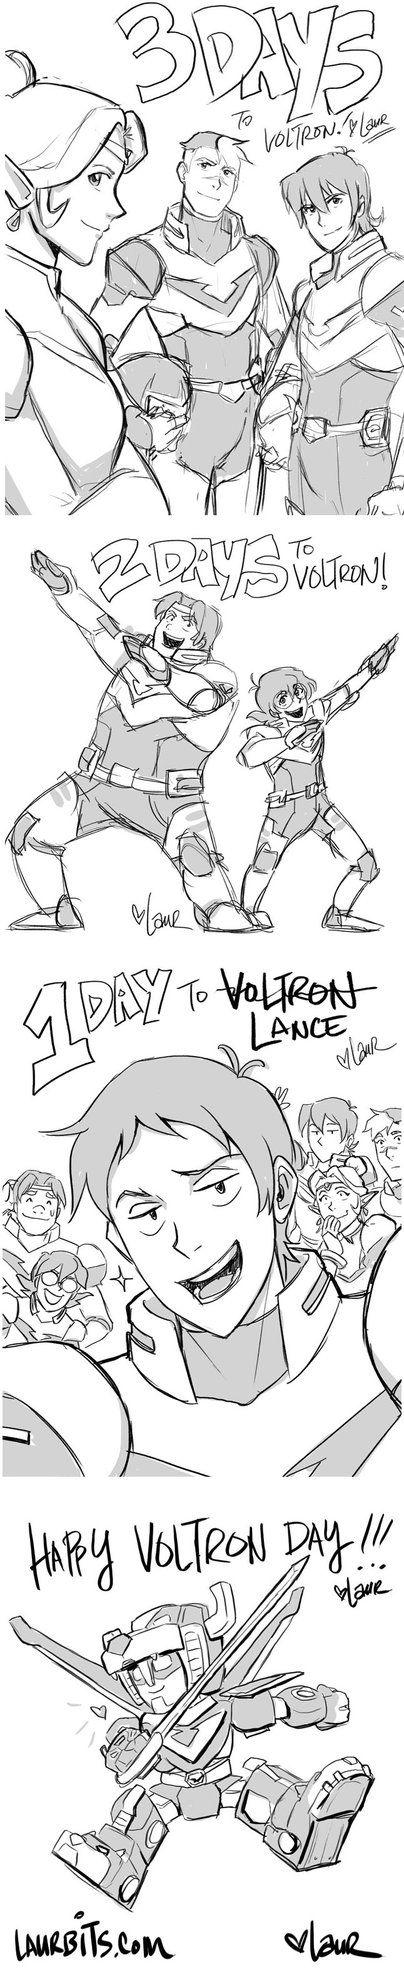 Countdown to Voltron sketches by laurbits.deviantart.com on @DeviantArt